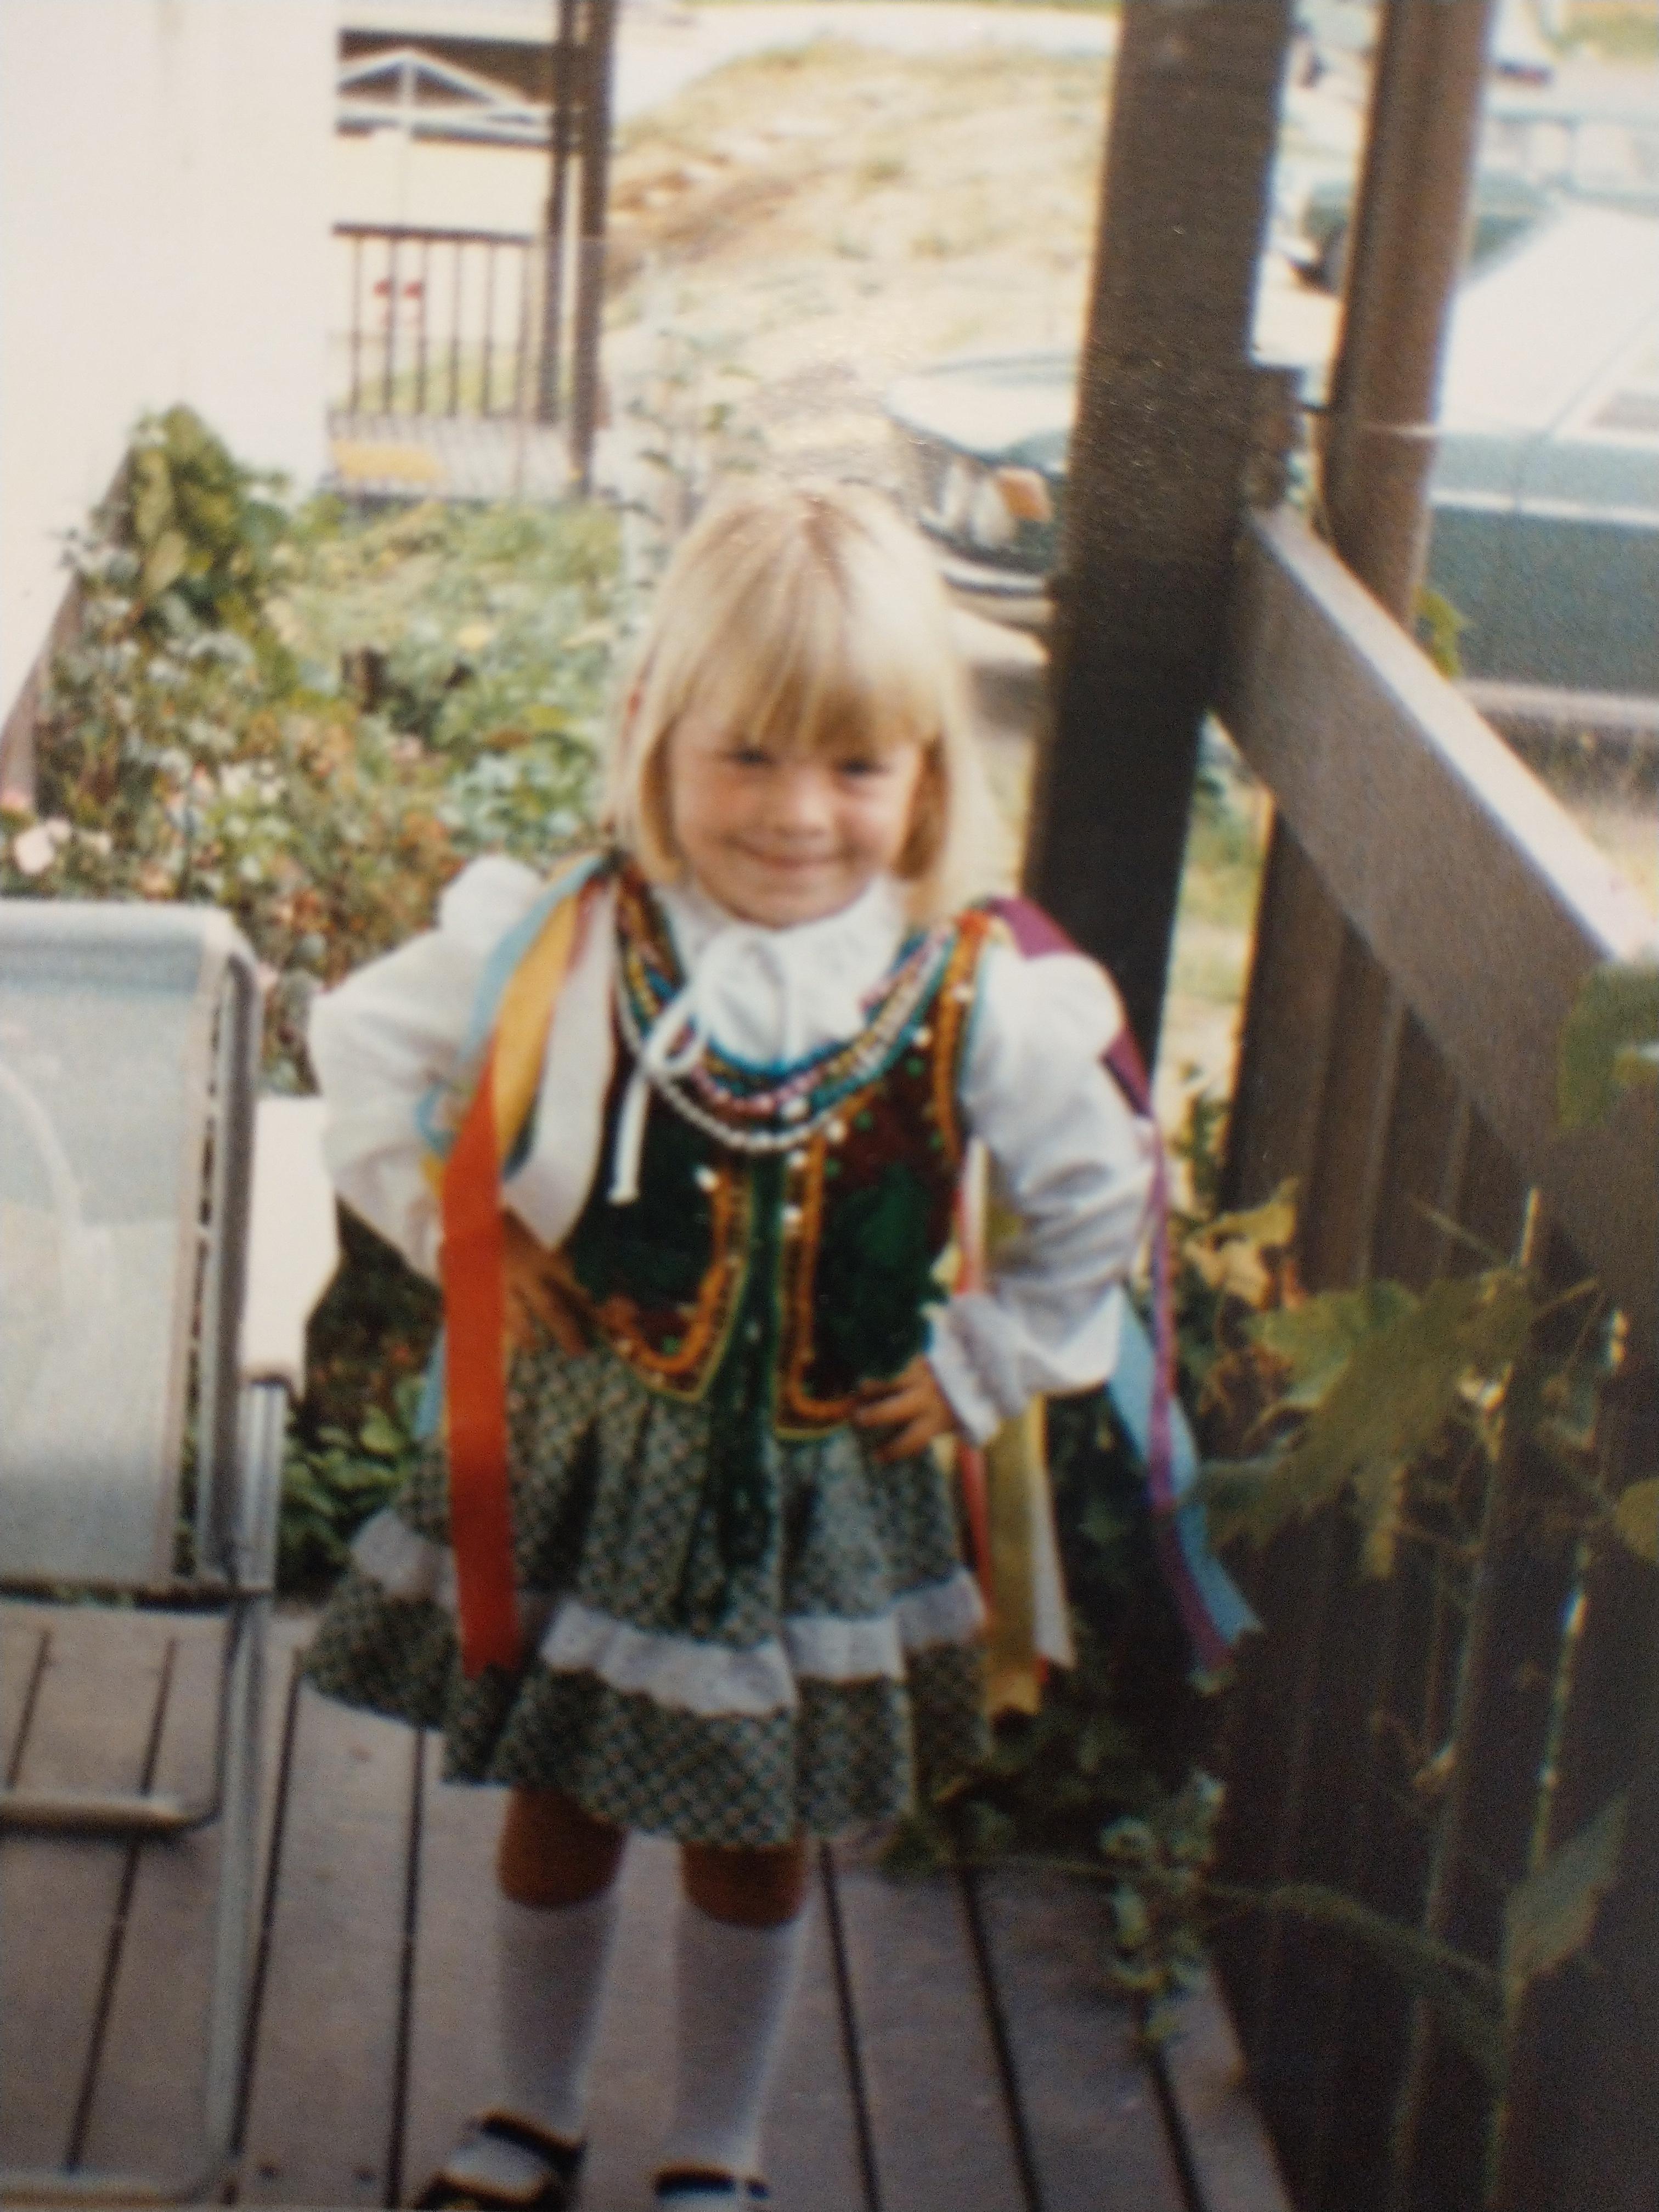 Anna in her costume